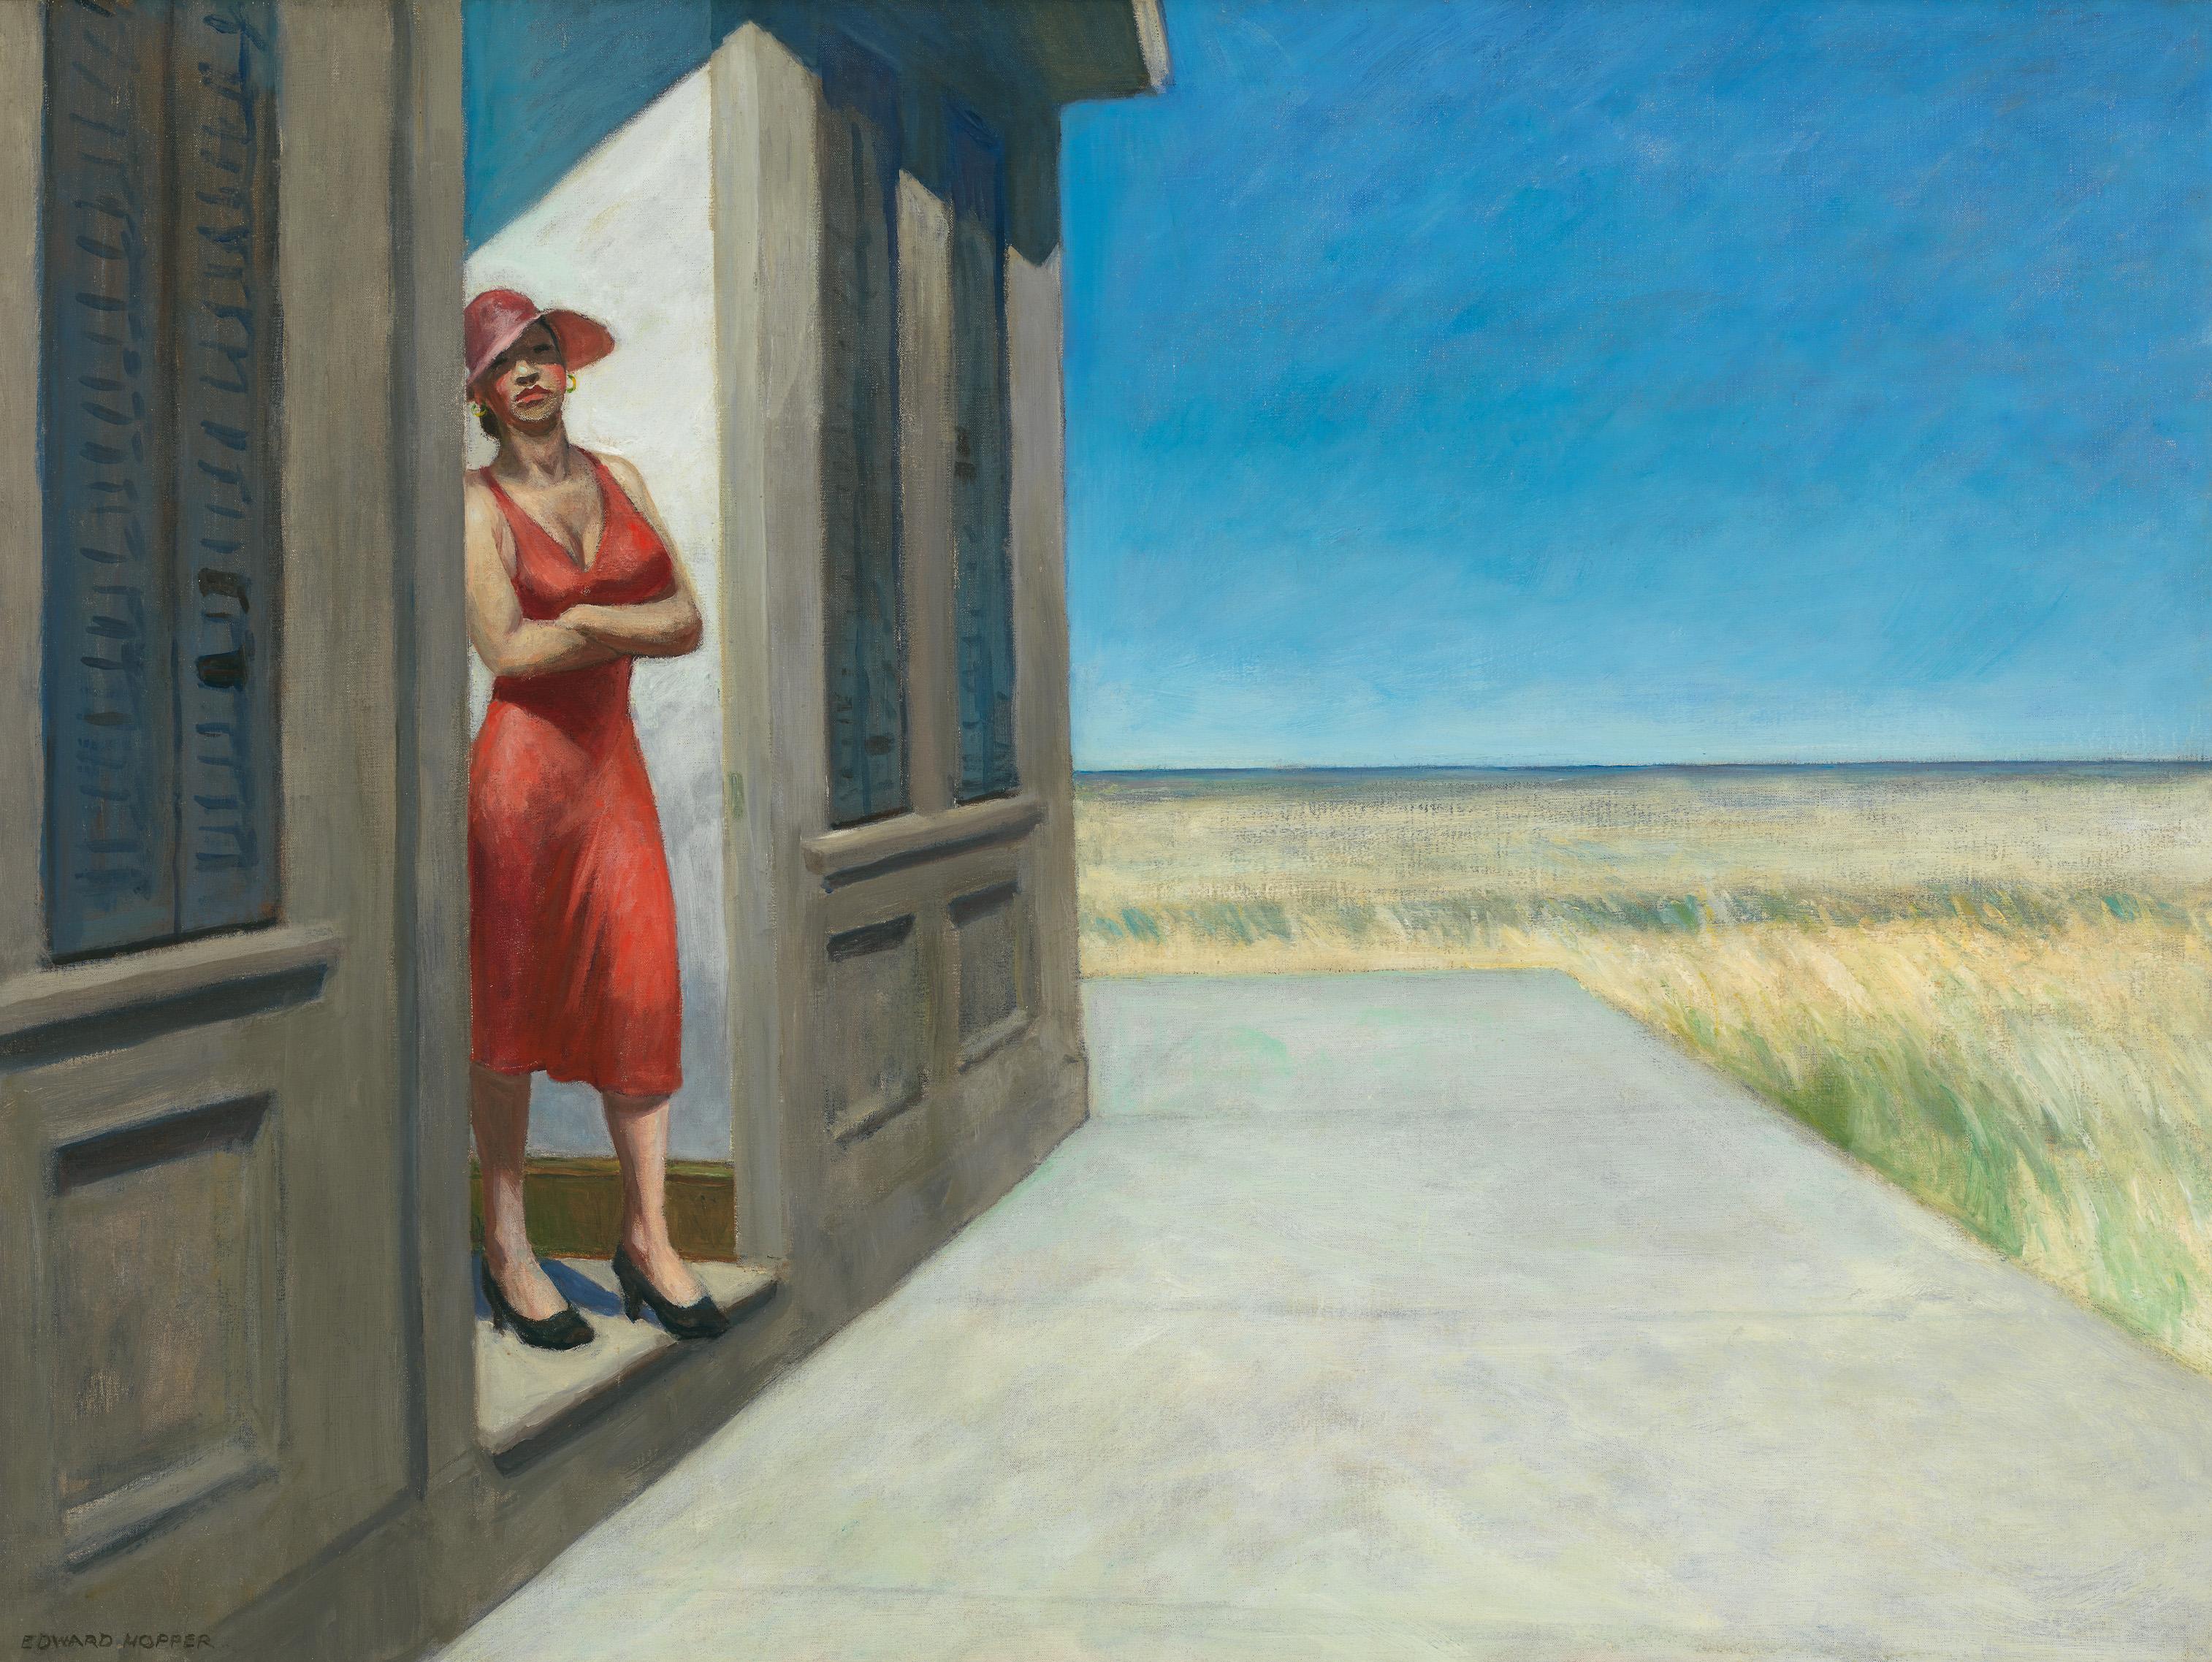 Edward Hopper (1882 1967) South Carolina Morning 1955